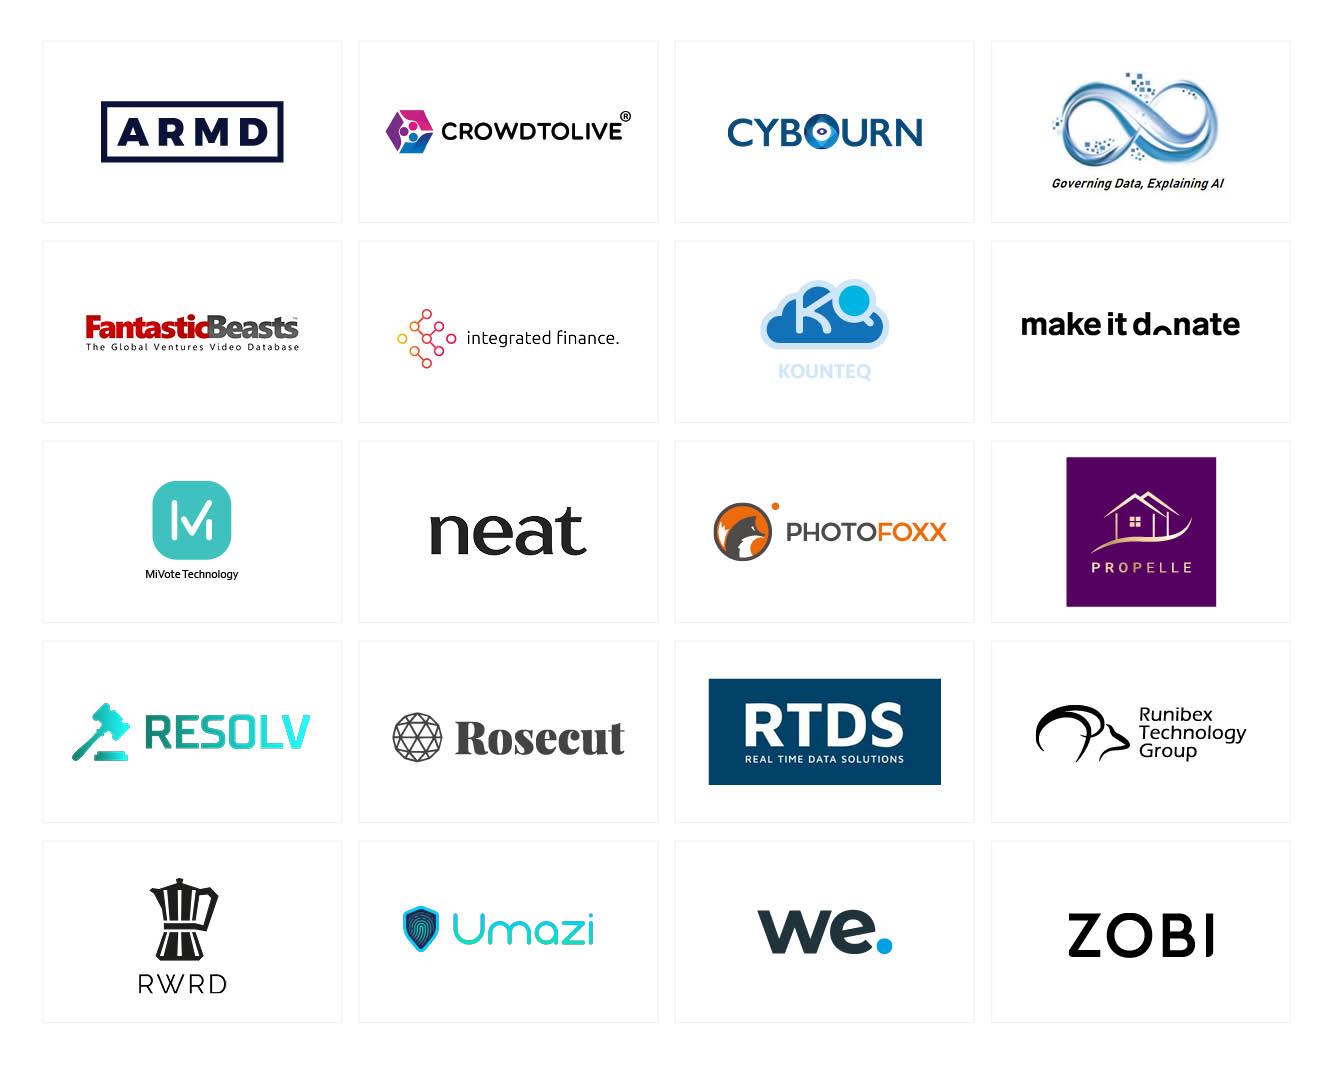 FBST companies